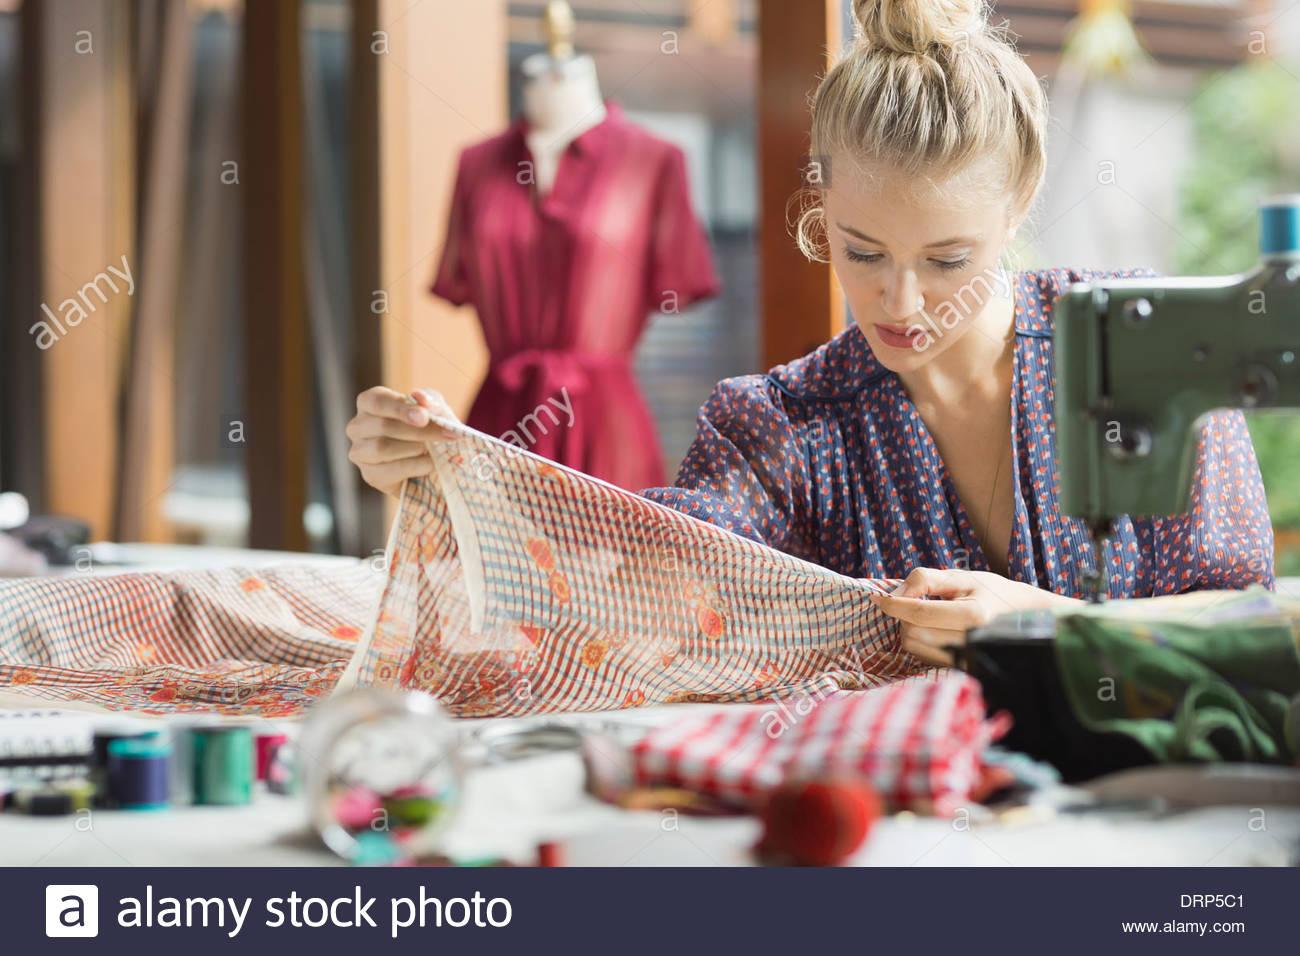 Fashion designer working in studio - Stock Image